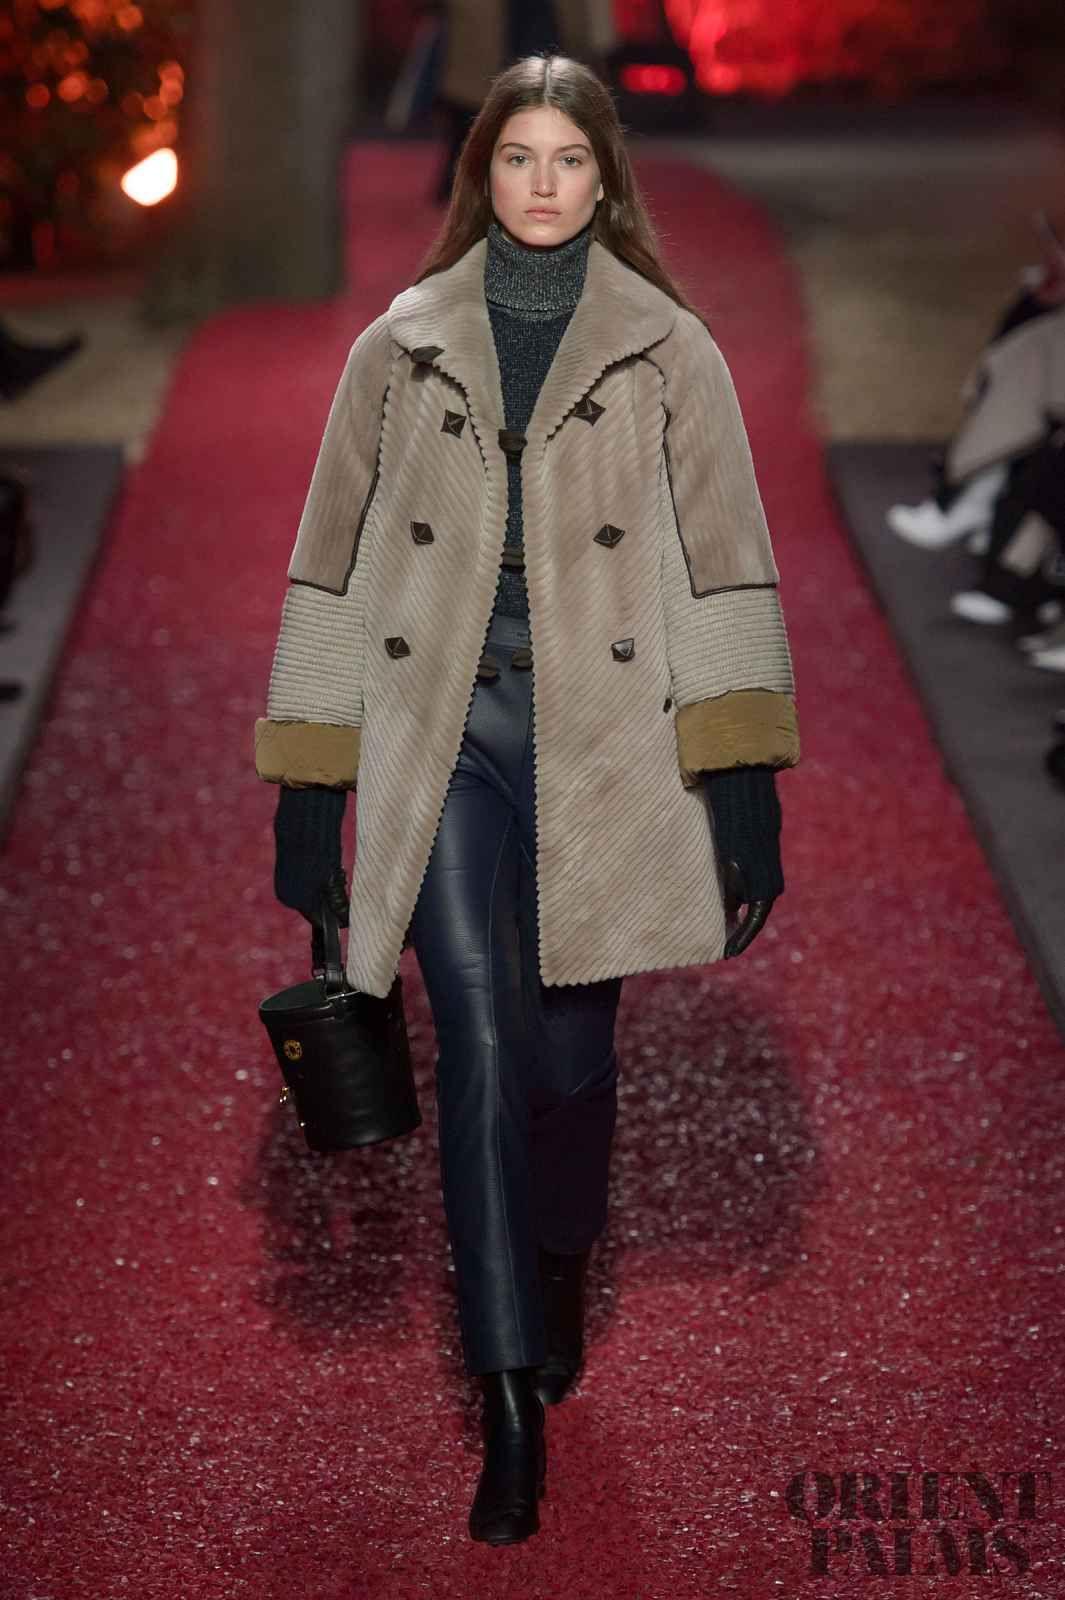 Hermes Fall-winter 2018-2019 - Ready-to-Wear   Cappotti   Moda ... 86bf900176b